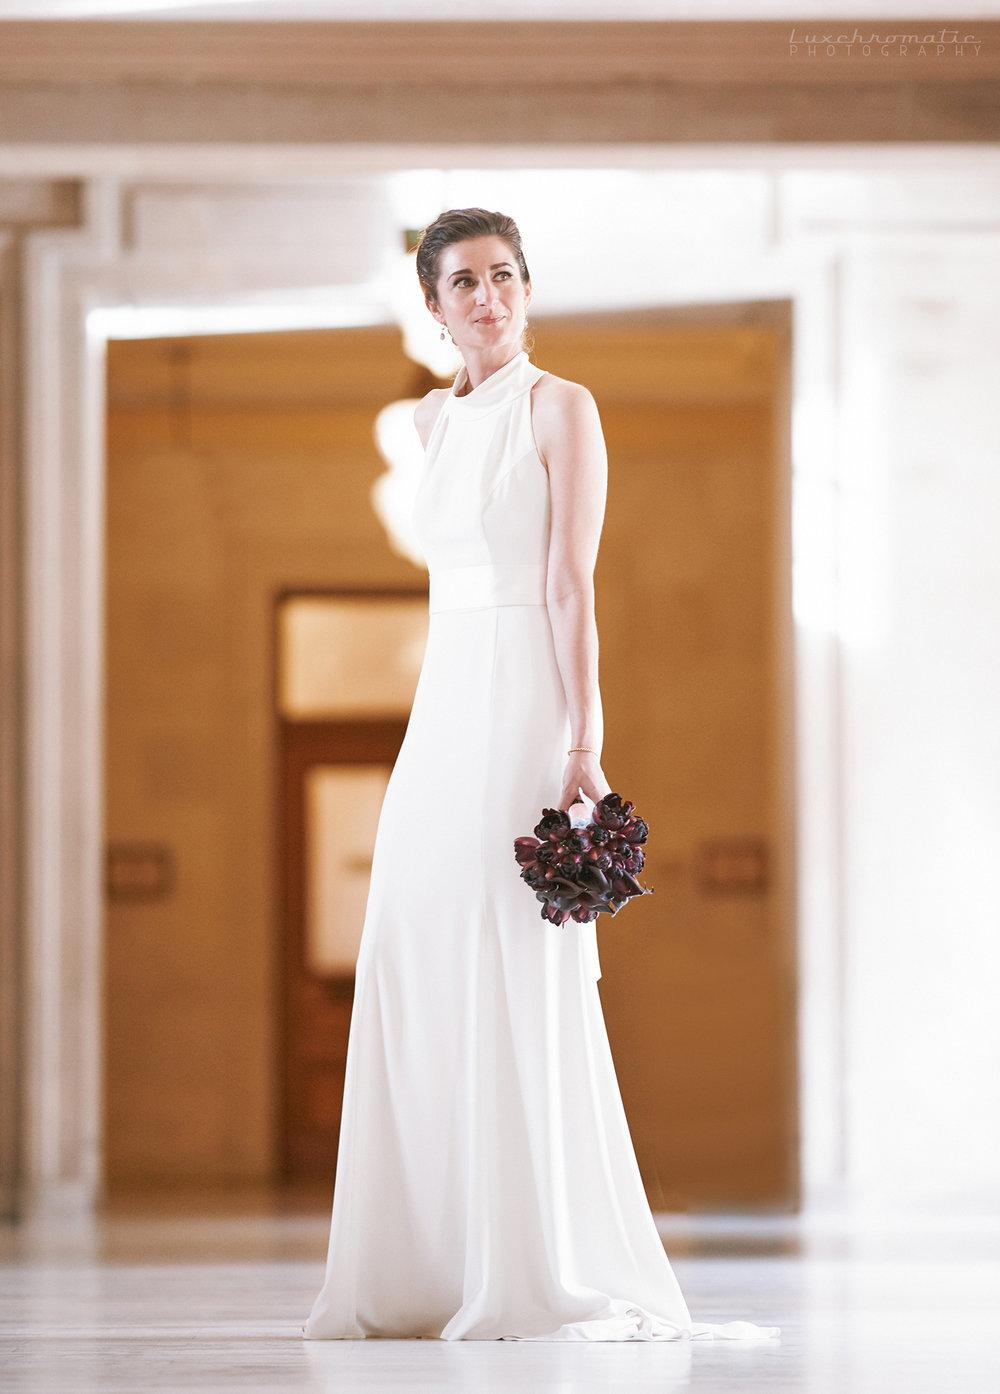 040318_Erin_Brent_0313-weddingdress-bride-weddingphotography-weddingphotographer-bridal-groom-wedding-engagementring-proposal-brides-elopement-sonyalpha-sony-sonya9-sonya7riii-sanfrancisco-sf-bayarea-photographer-profoto-city-hall.jpg